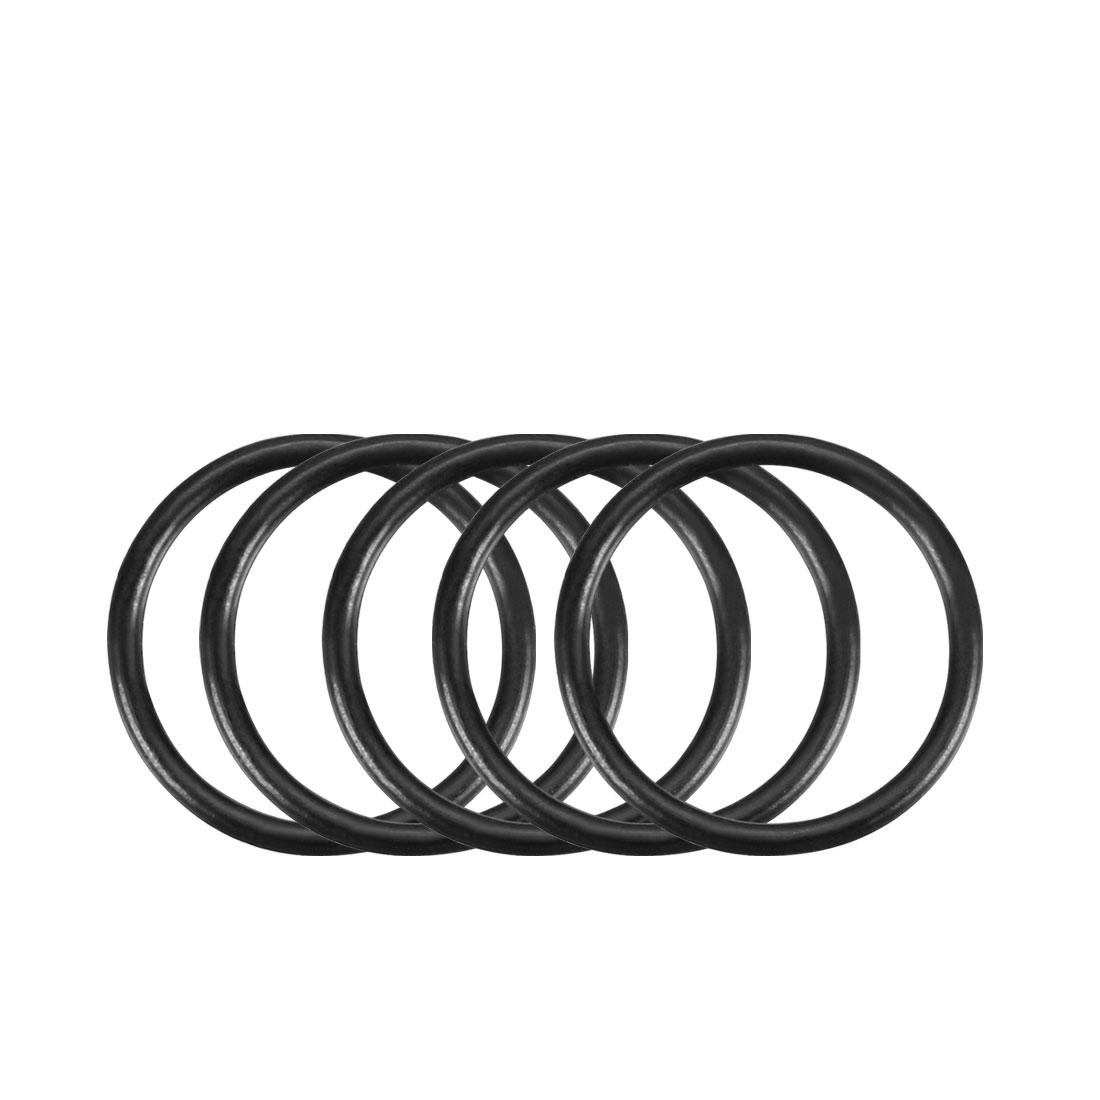 100Pcs Black 12mm x 1mm Nitrile Rubber O Ring NBR Oil Sealing Grommets